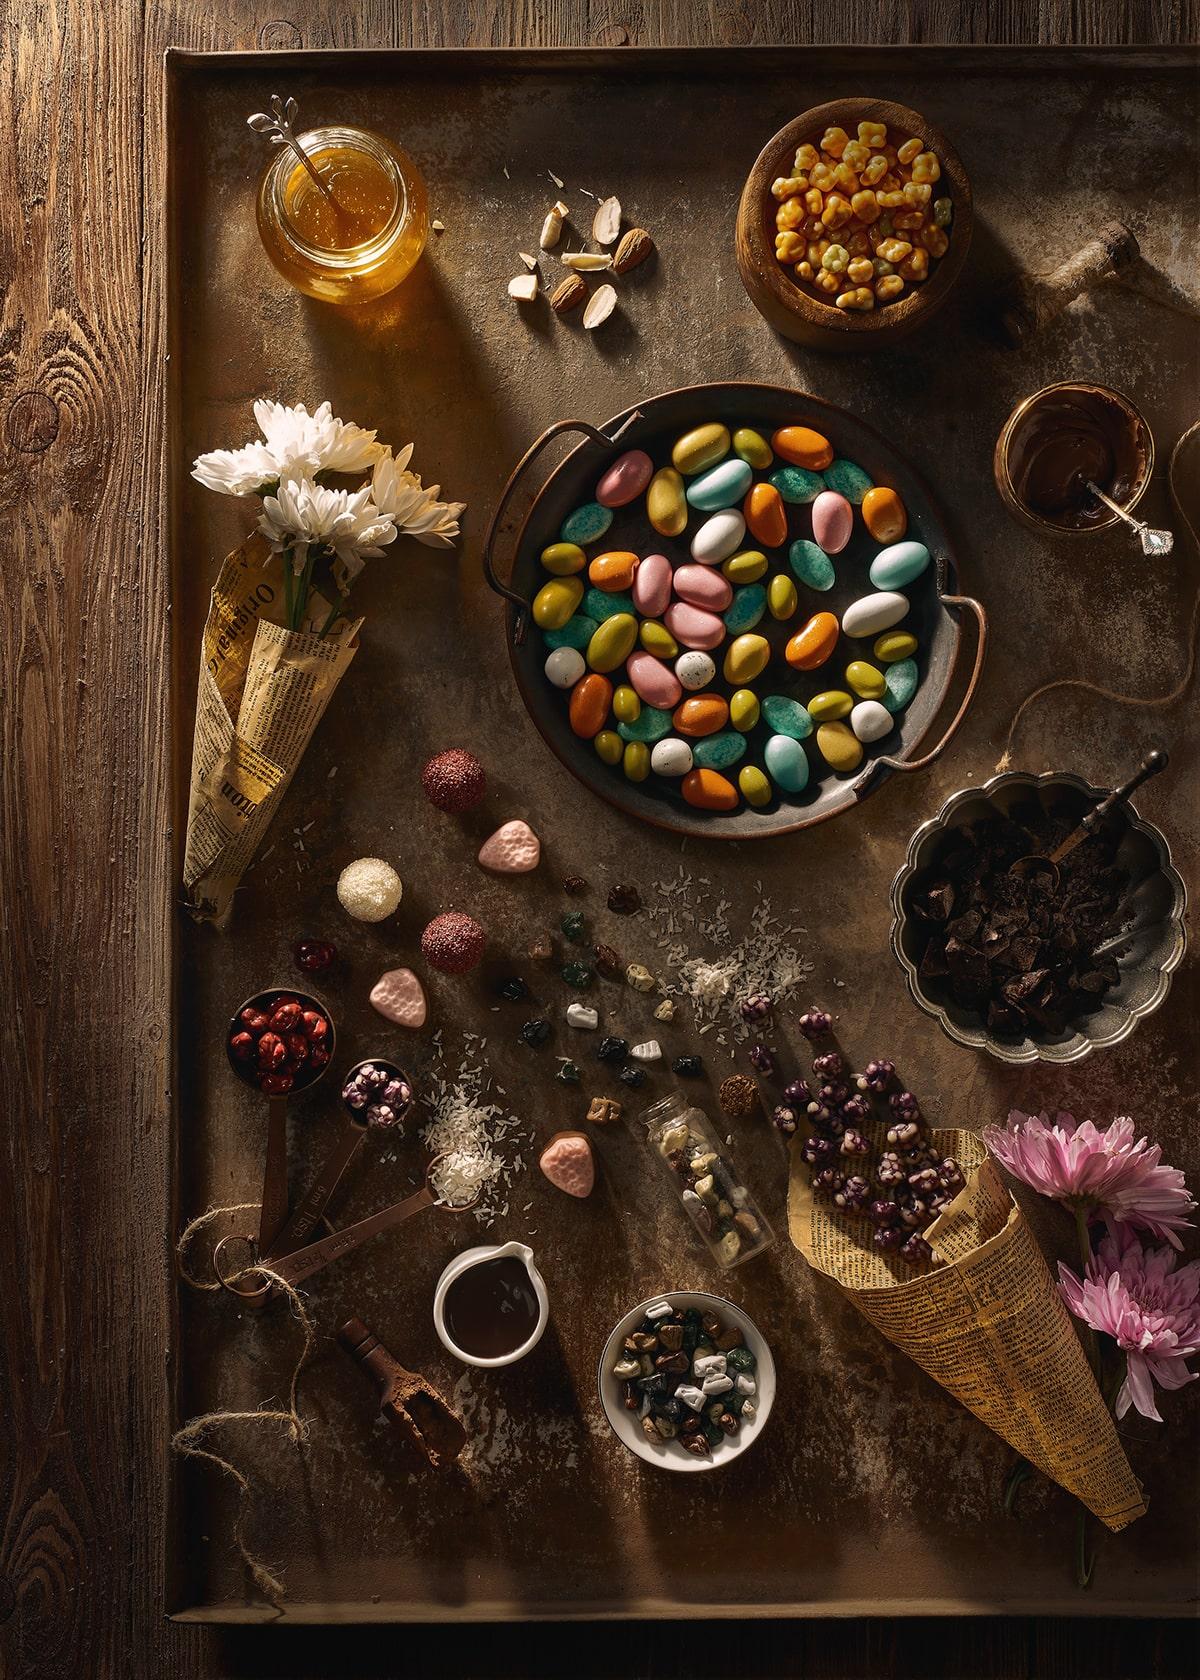 photography-chocolate-egypt-1.jpg